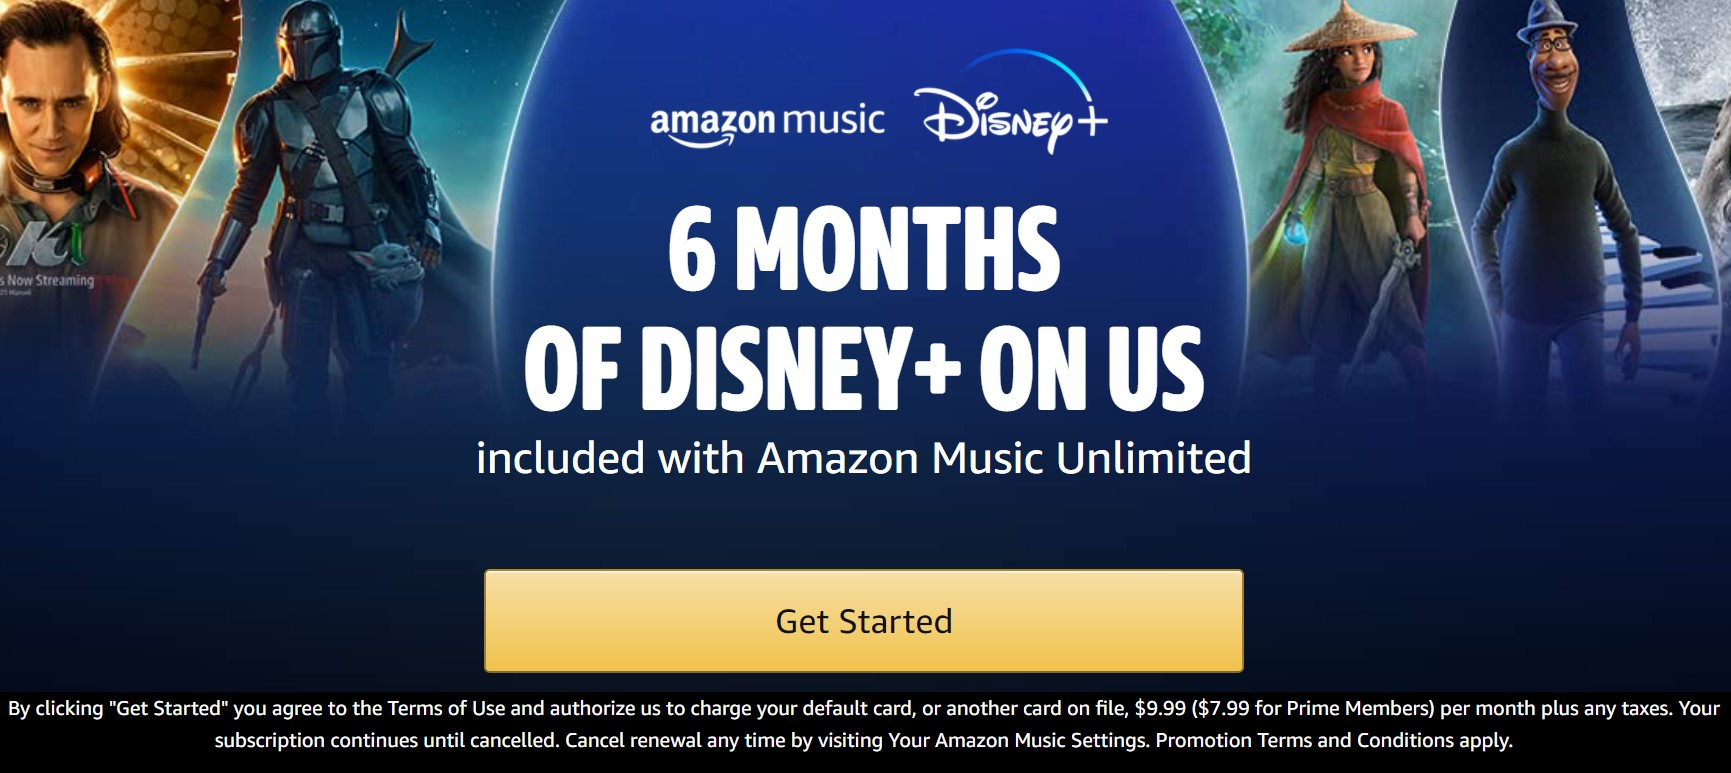 Amazon Music e Disney Plus Promo Image 1